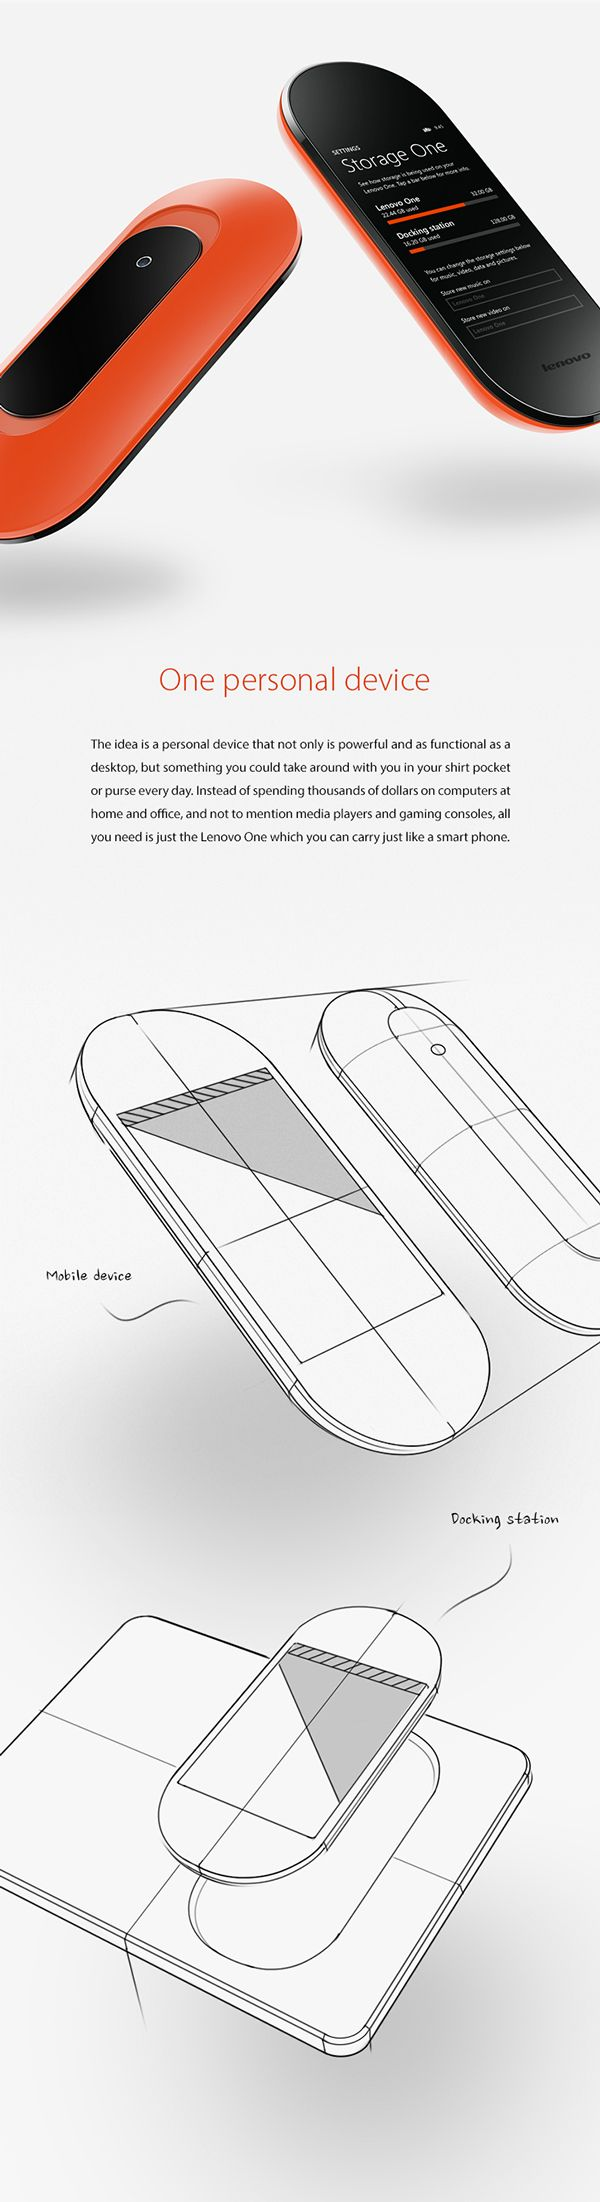 Lenovo Mobile Computing by Peter Braakhuis, via Behance